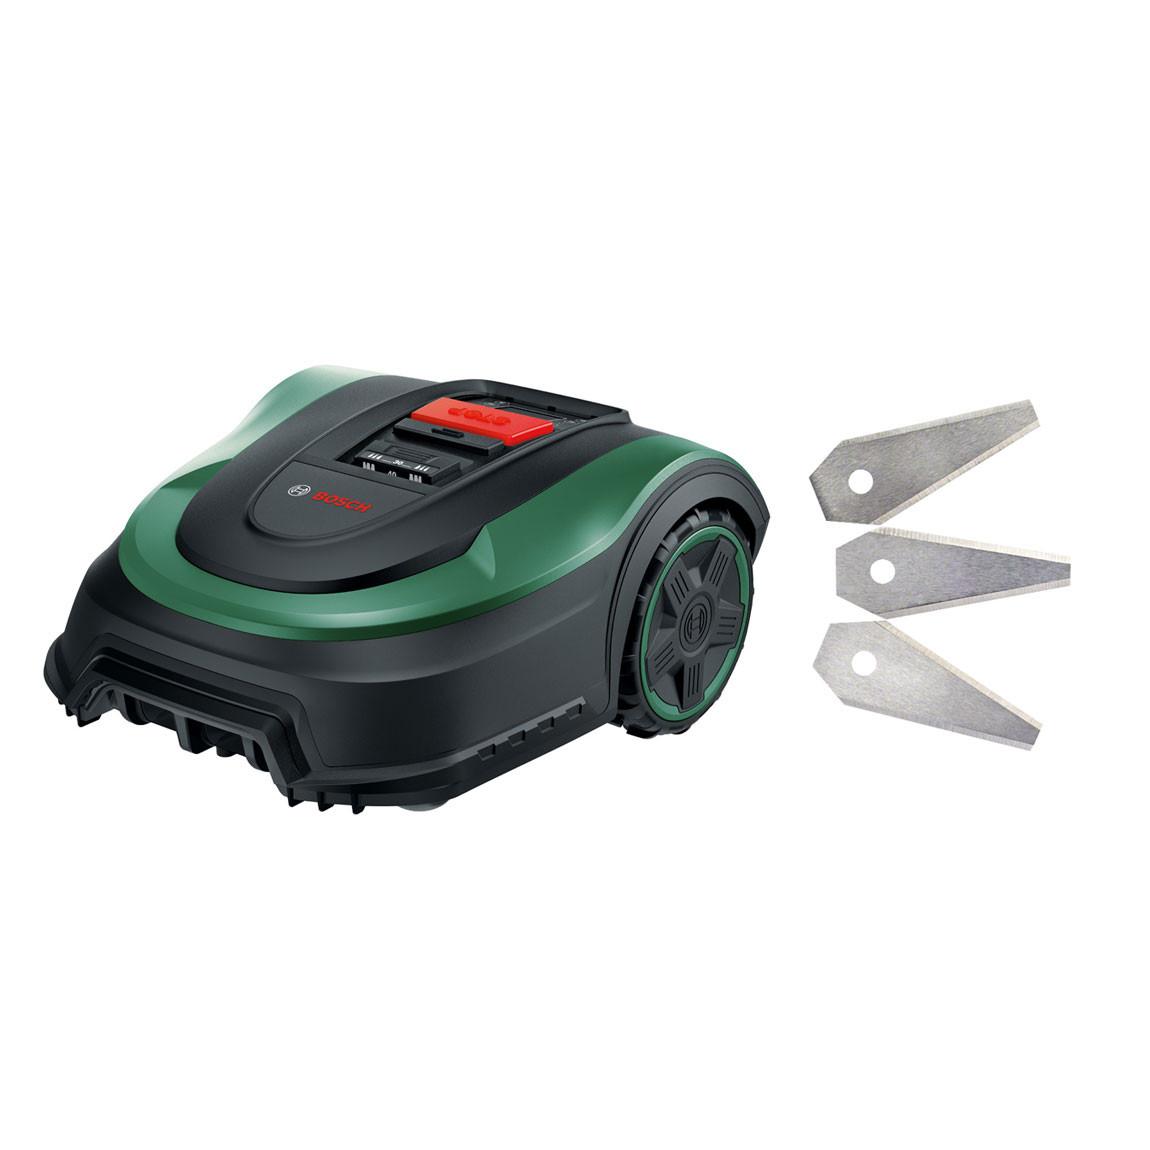 Bosch Indego M+ 700 Robotmaaier + extra messen €864 voor na cashback @ tink